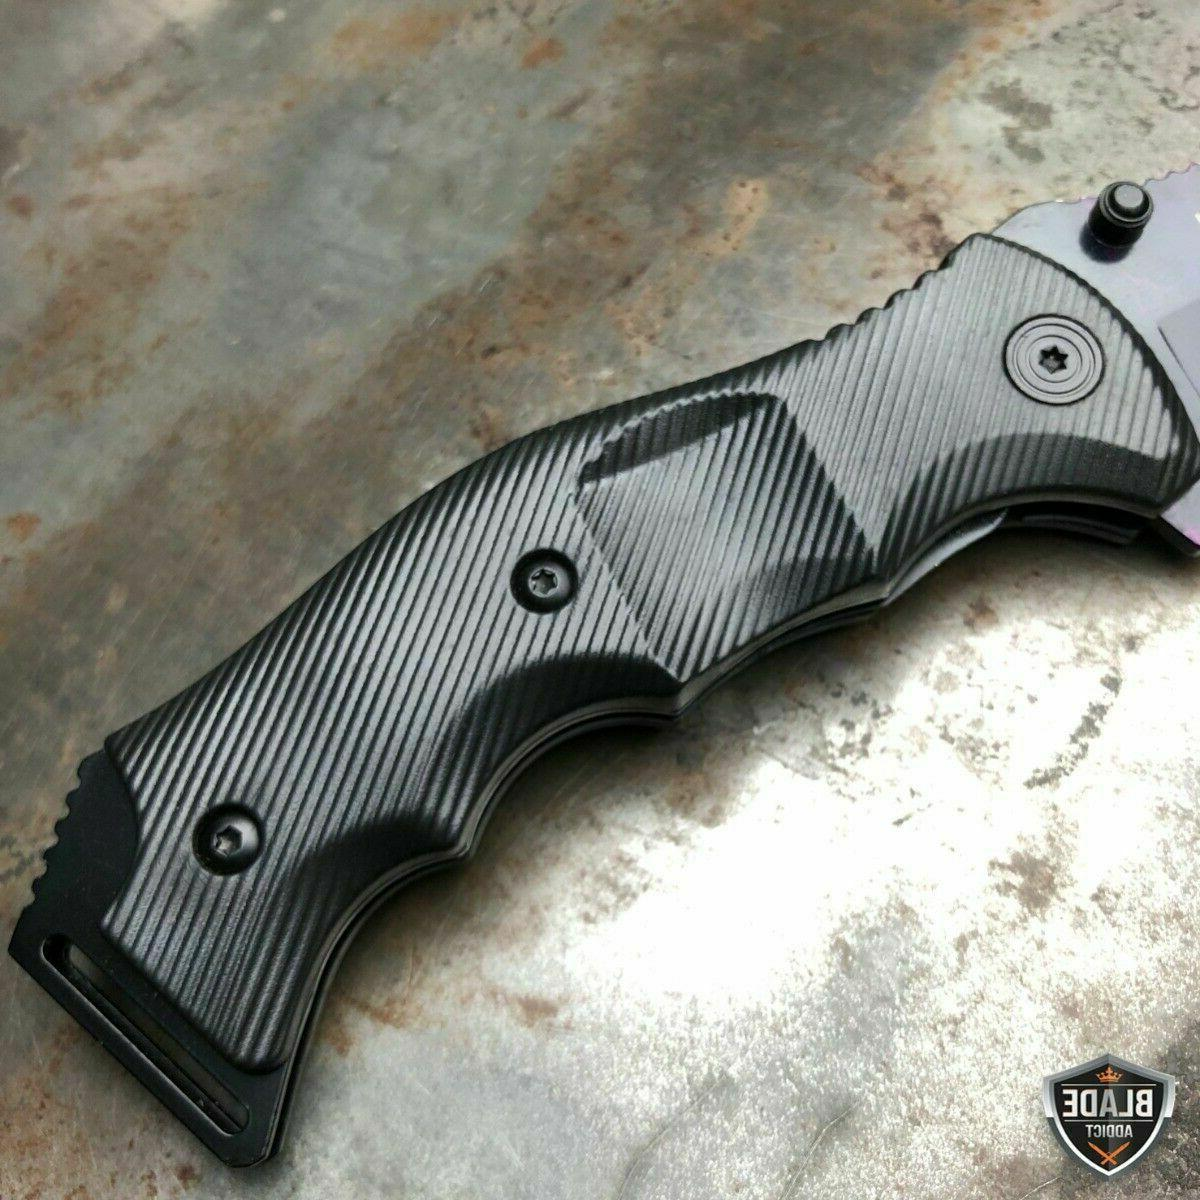 TACTICAL Assisted Pocket FOLDING Blade